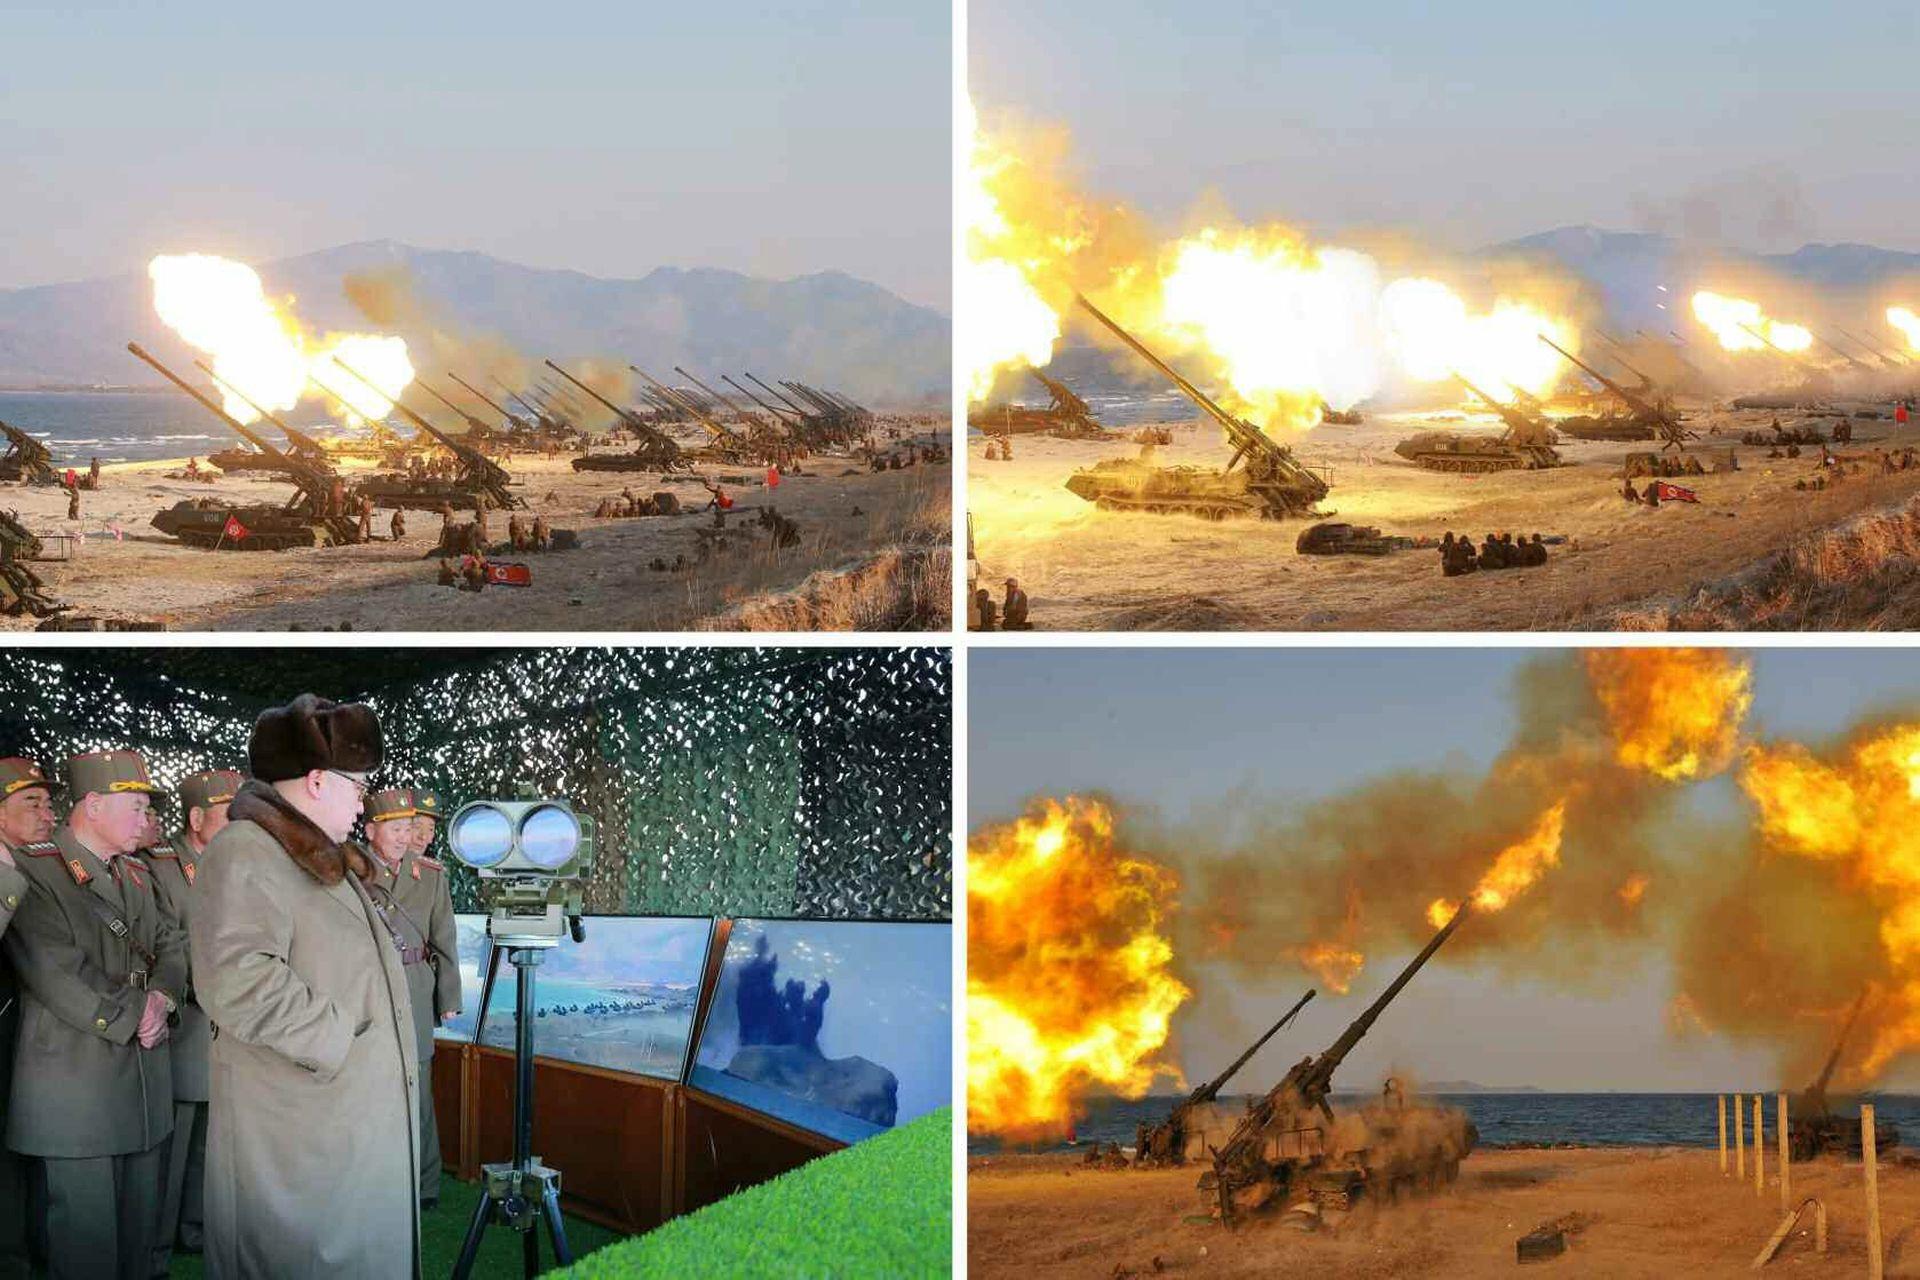 Pjongjang ispalio novi projektil kratkog dometa